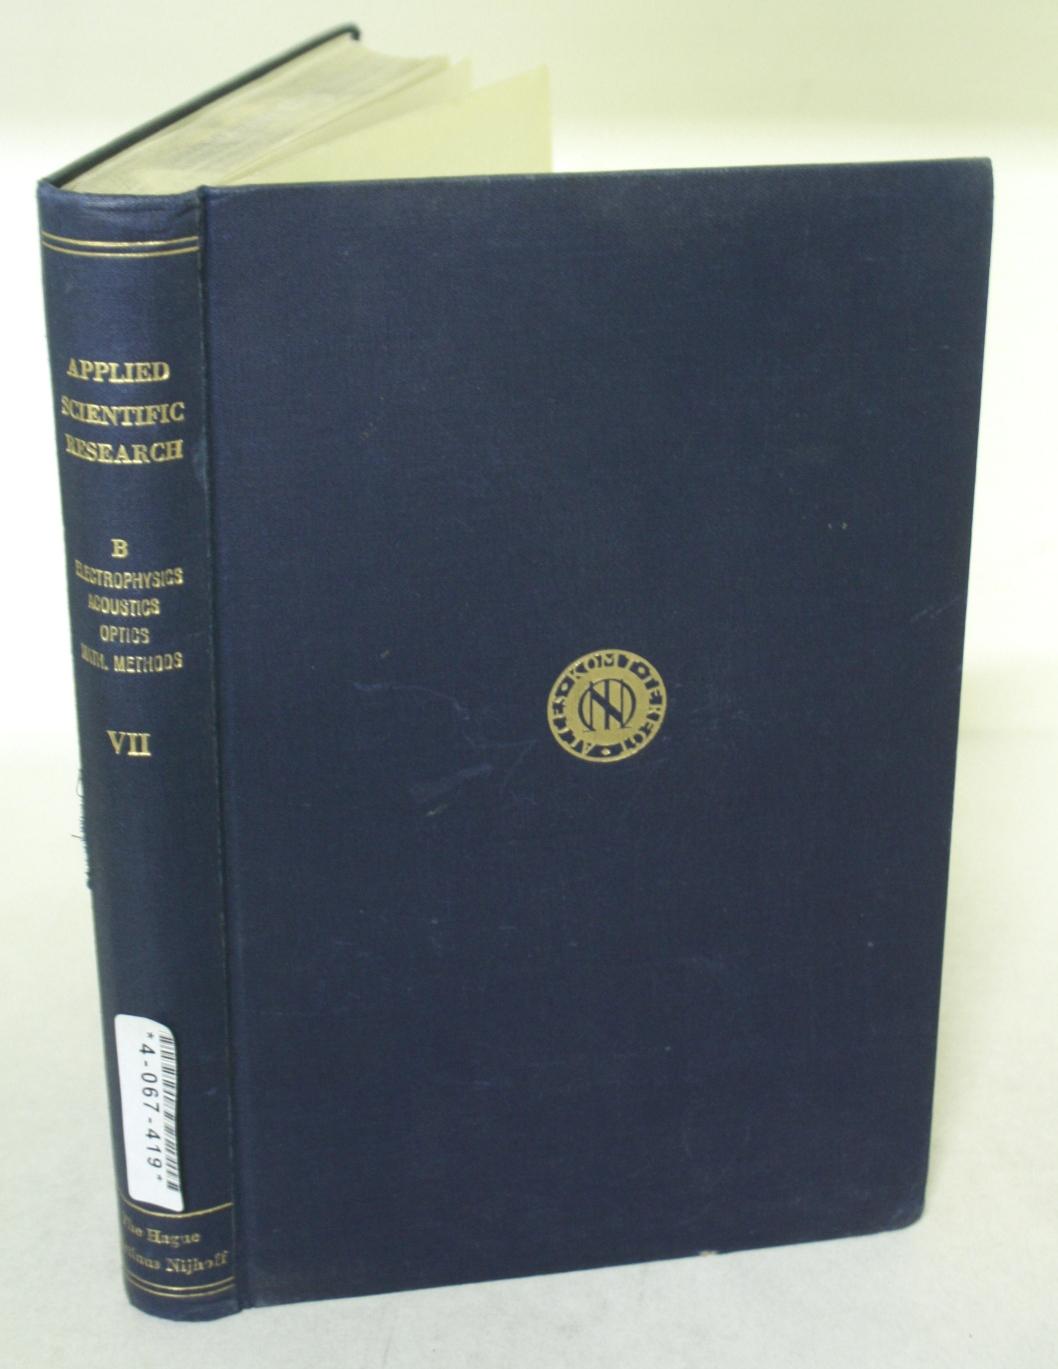 Applied Scientific Research Volume B VII - Electrophysics, Acoustics, Optics, Mathematical Methods